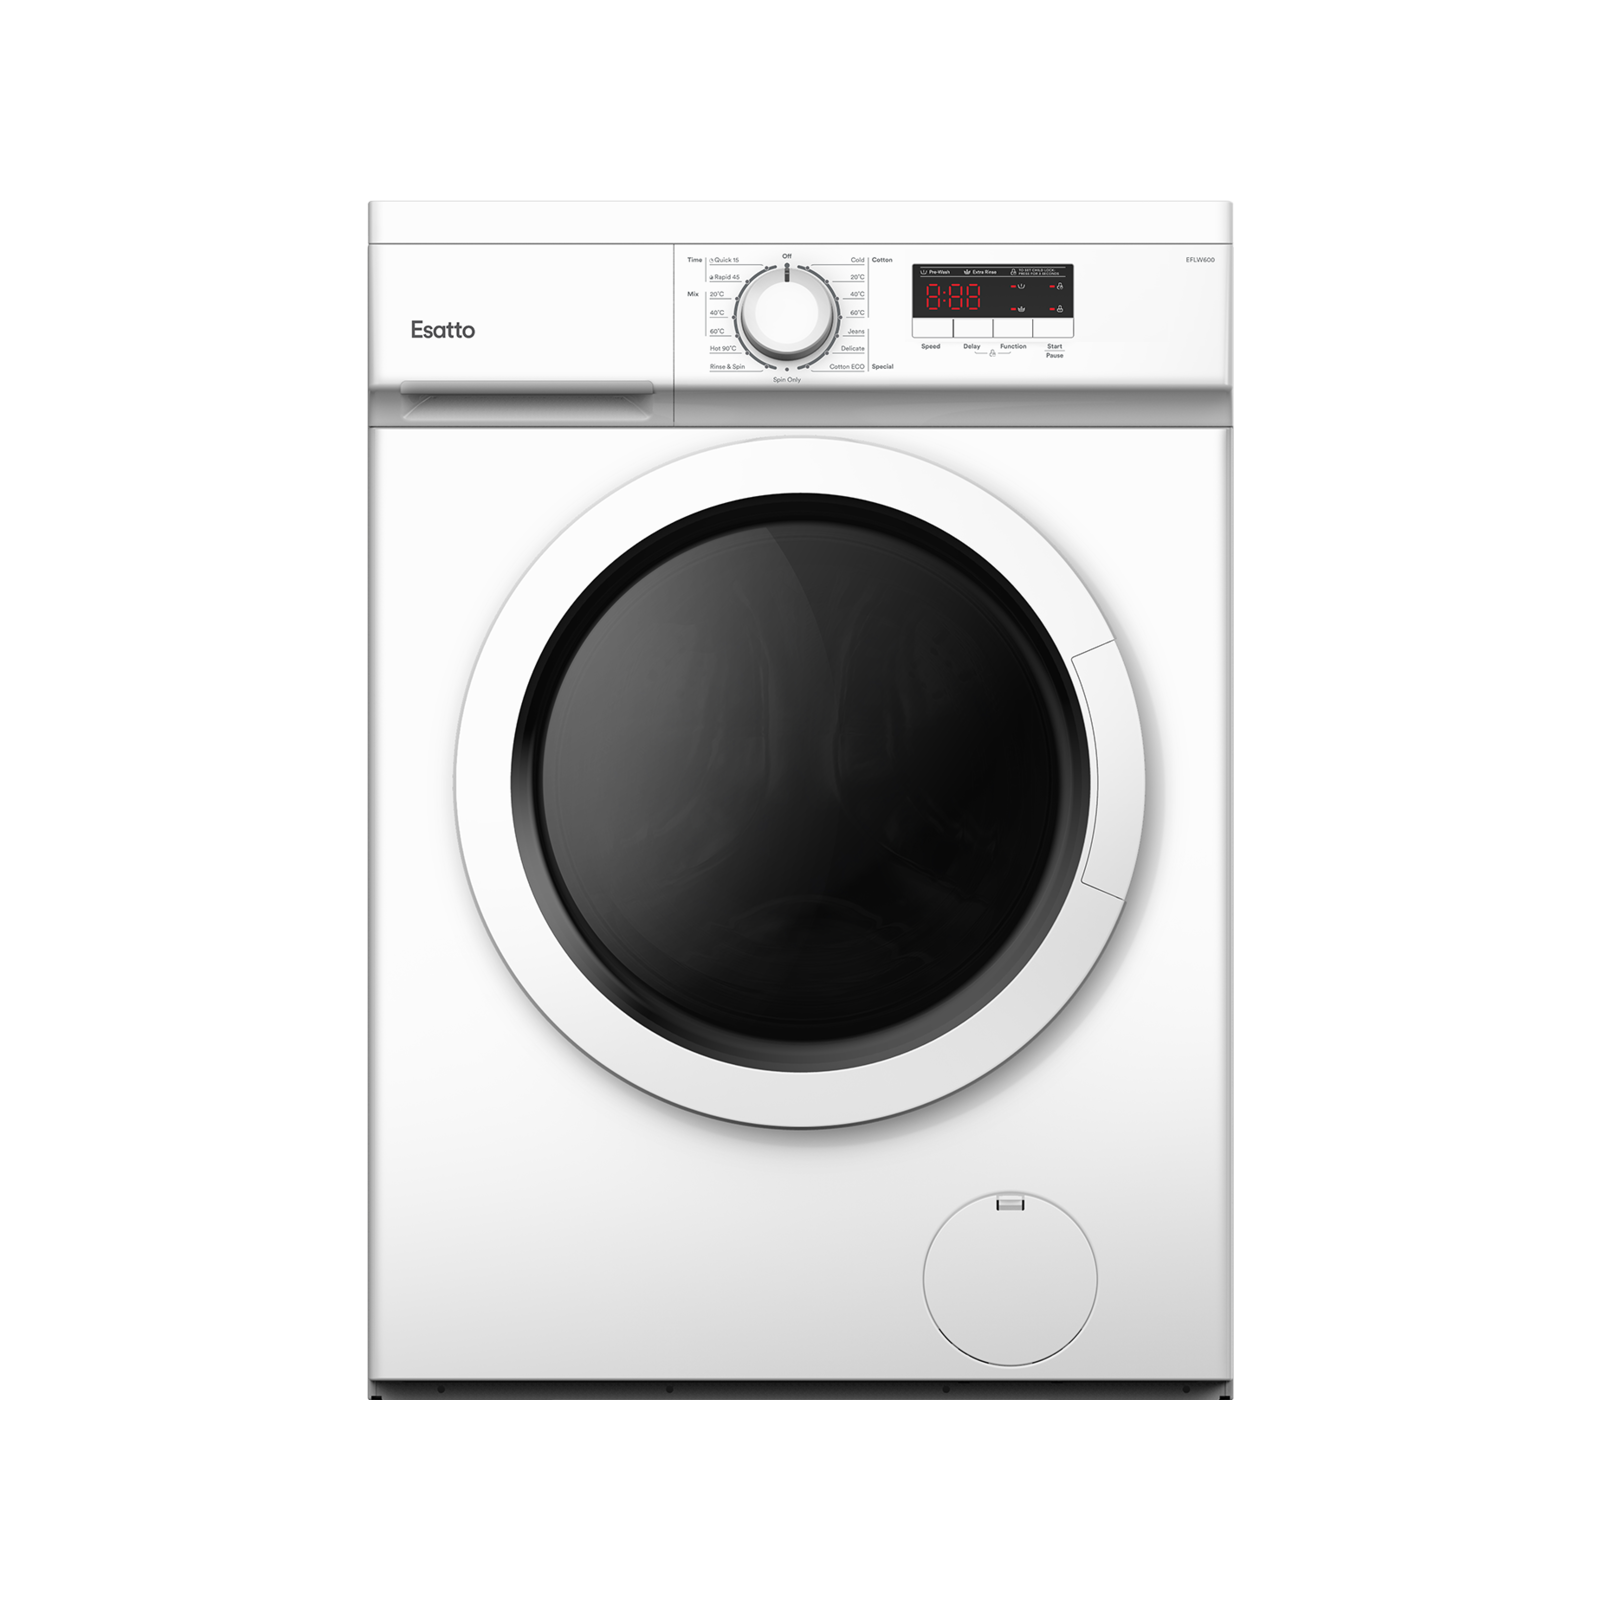 Esatto 6kg Front Load Washing Machine EFLW600